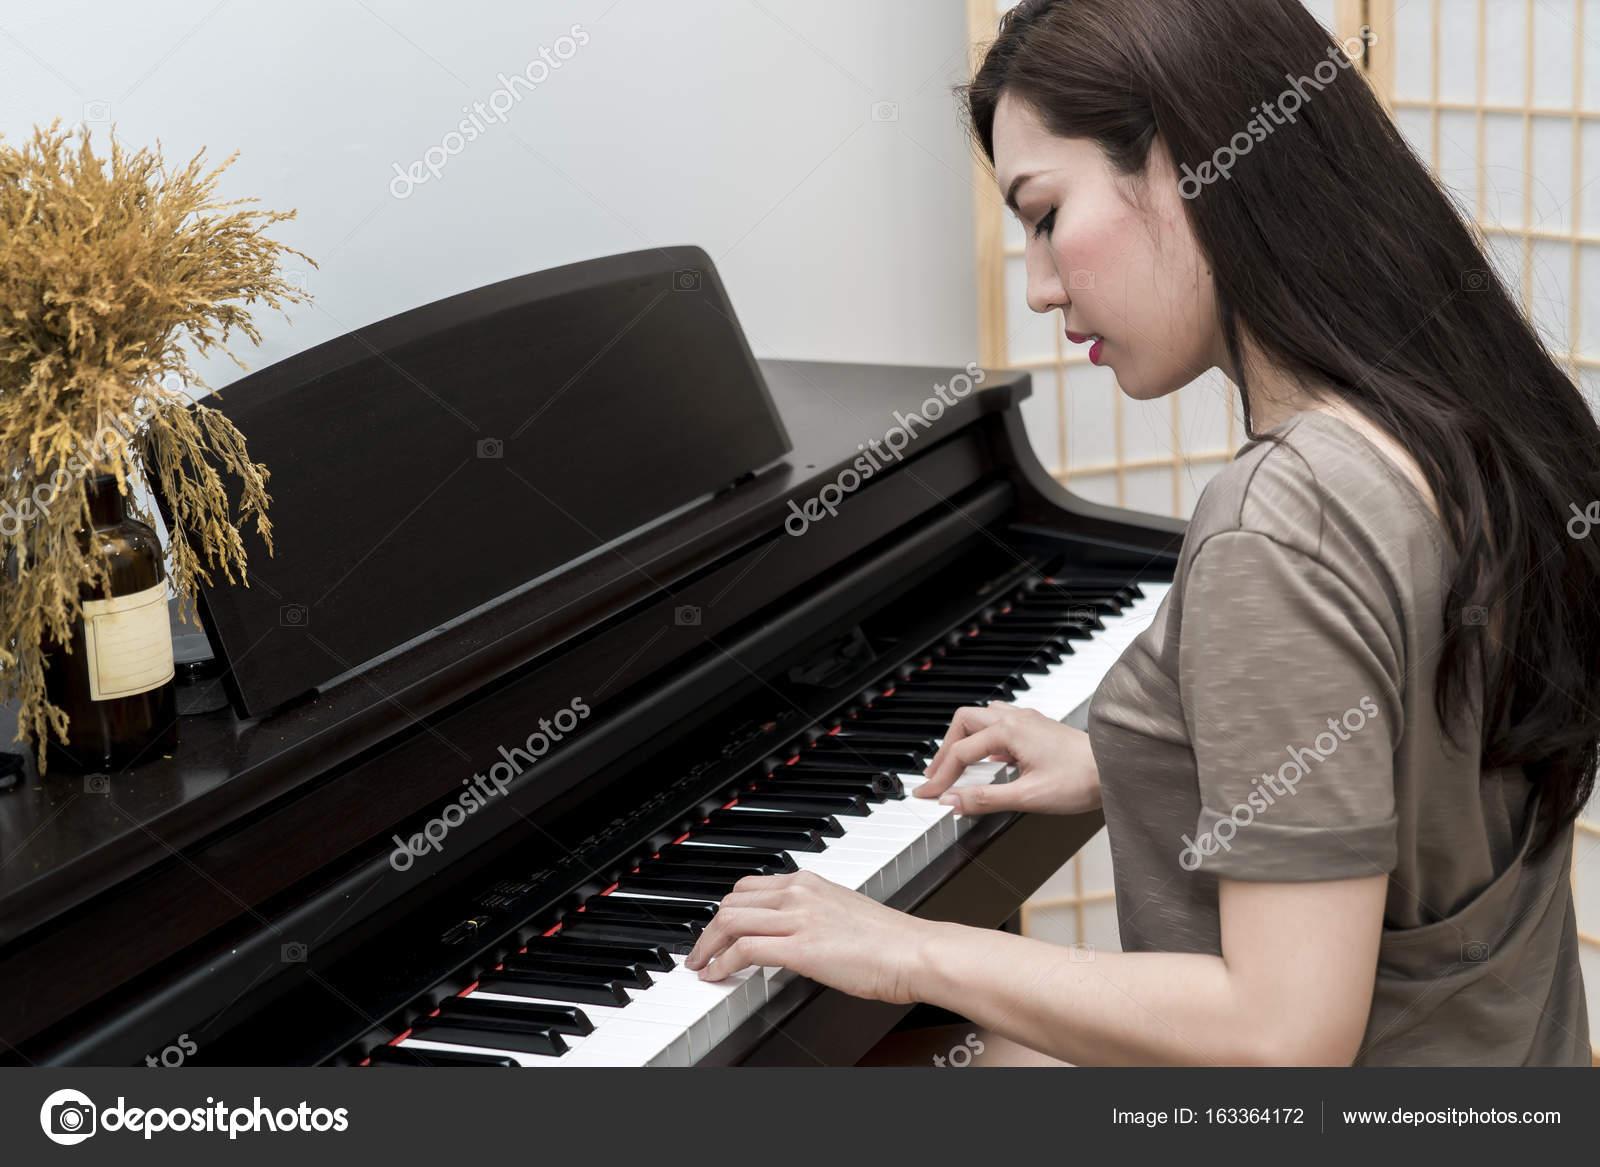 junge musiker frau spielt klavier im wohnzimmer stockfoto pixs4u 163364172. Black Bedroom Furniture Sets. Home Design Ideas